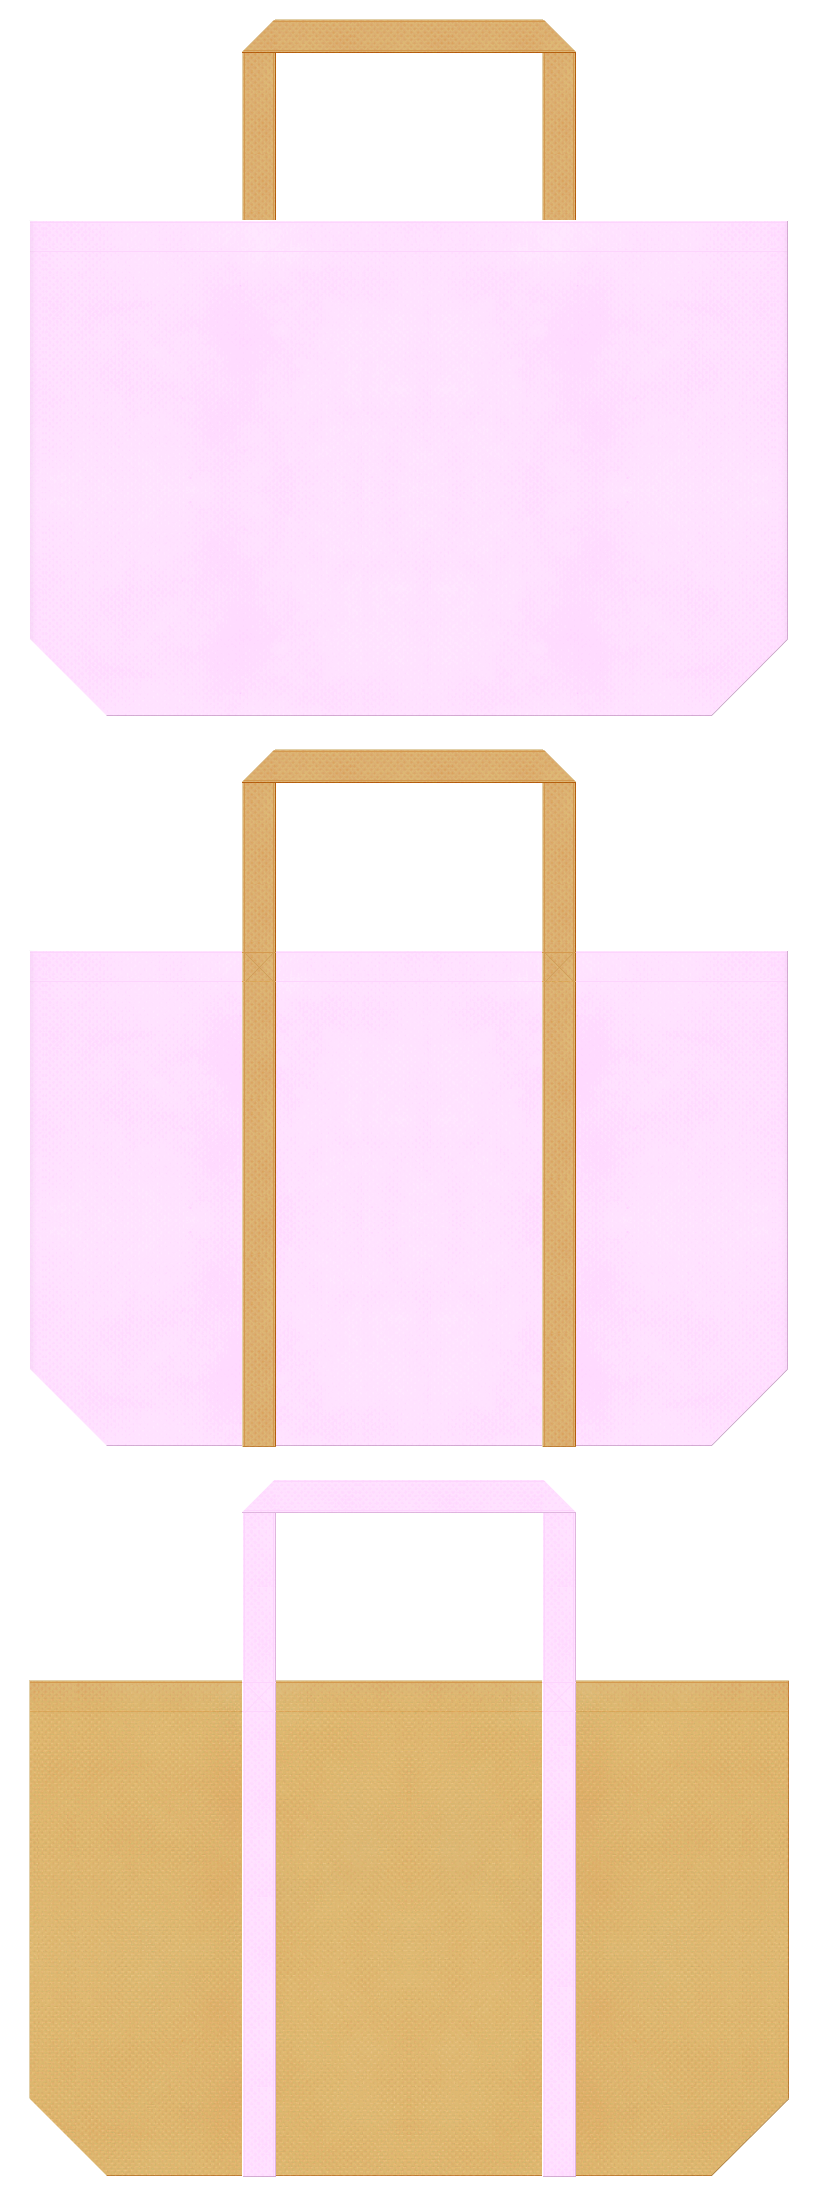 girlyなバッグノベルティにお奨めのコーデ。明るいピンク色と薄黄土色の不織布バッグデザイン。